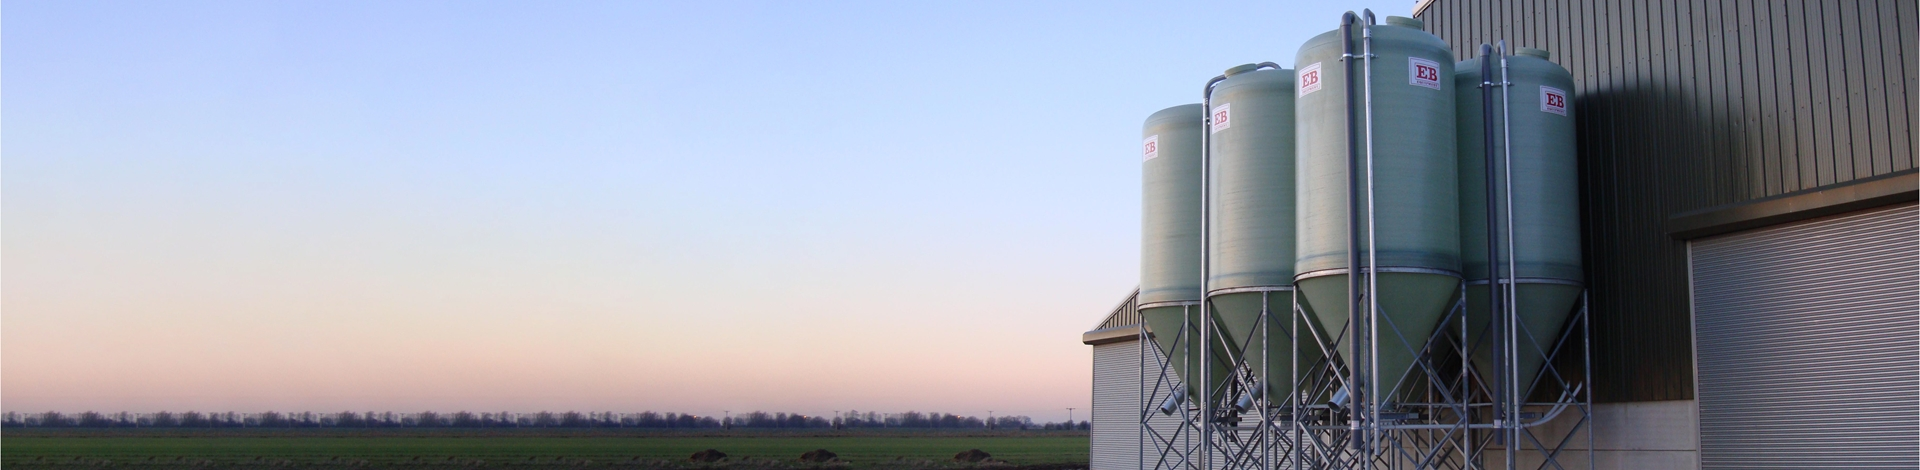 GRP Silos | EB Equipment LTD | Bulk Storage